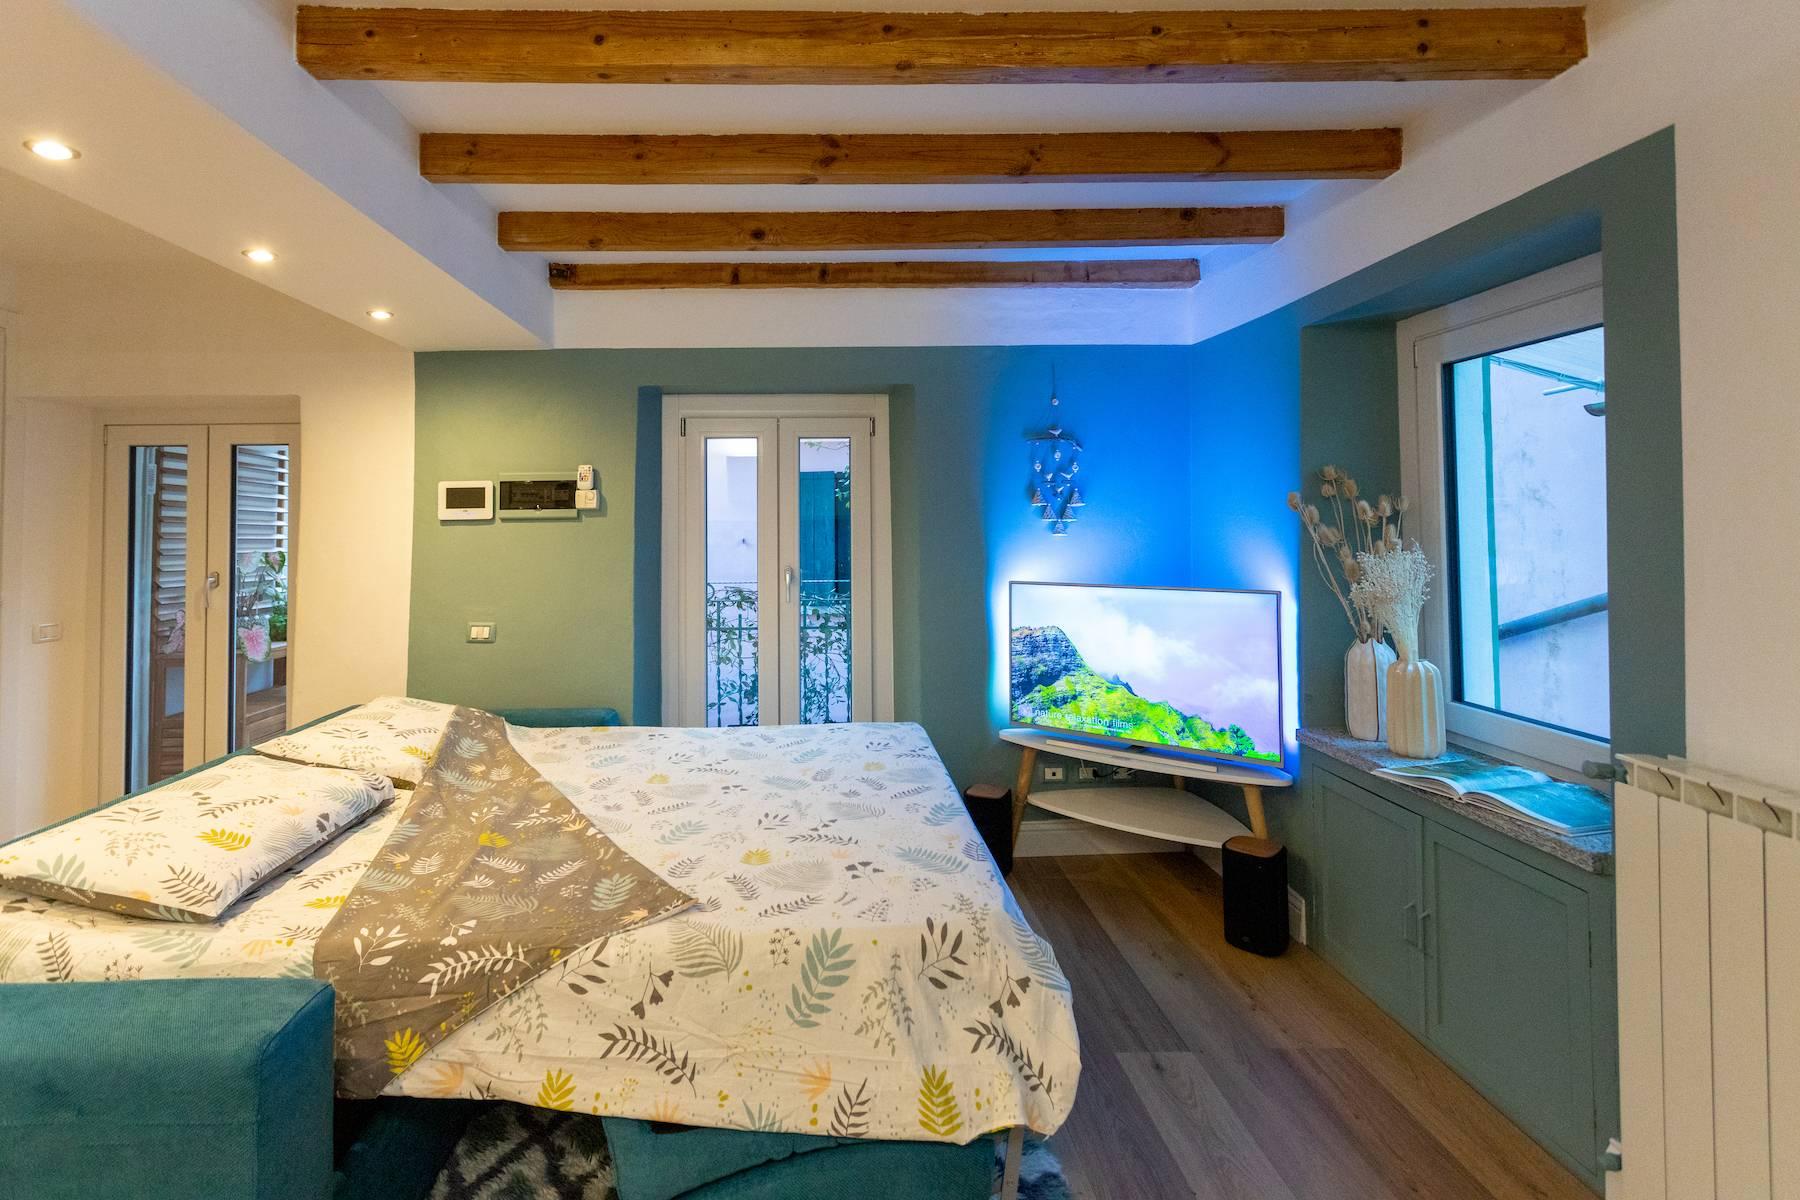 Appartamento in Vendita a Belgirate: 3 locali, 62 mq - Foto 14